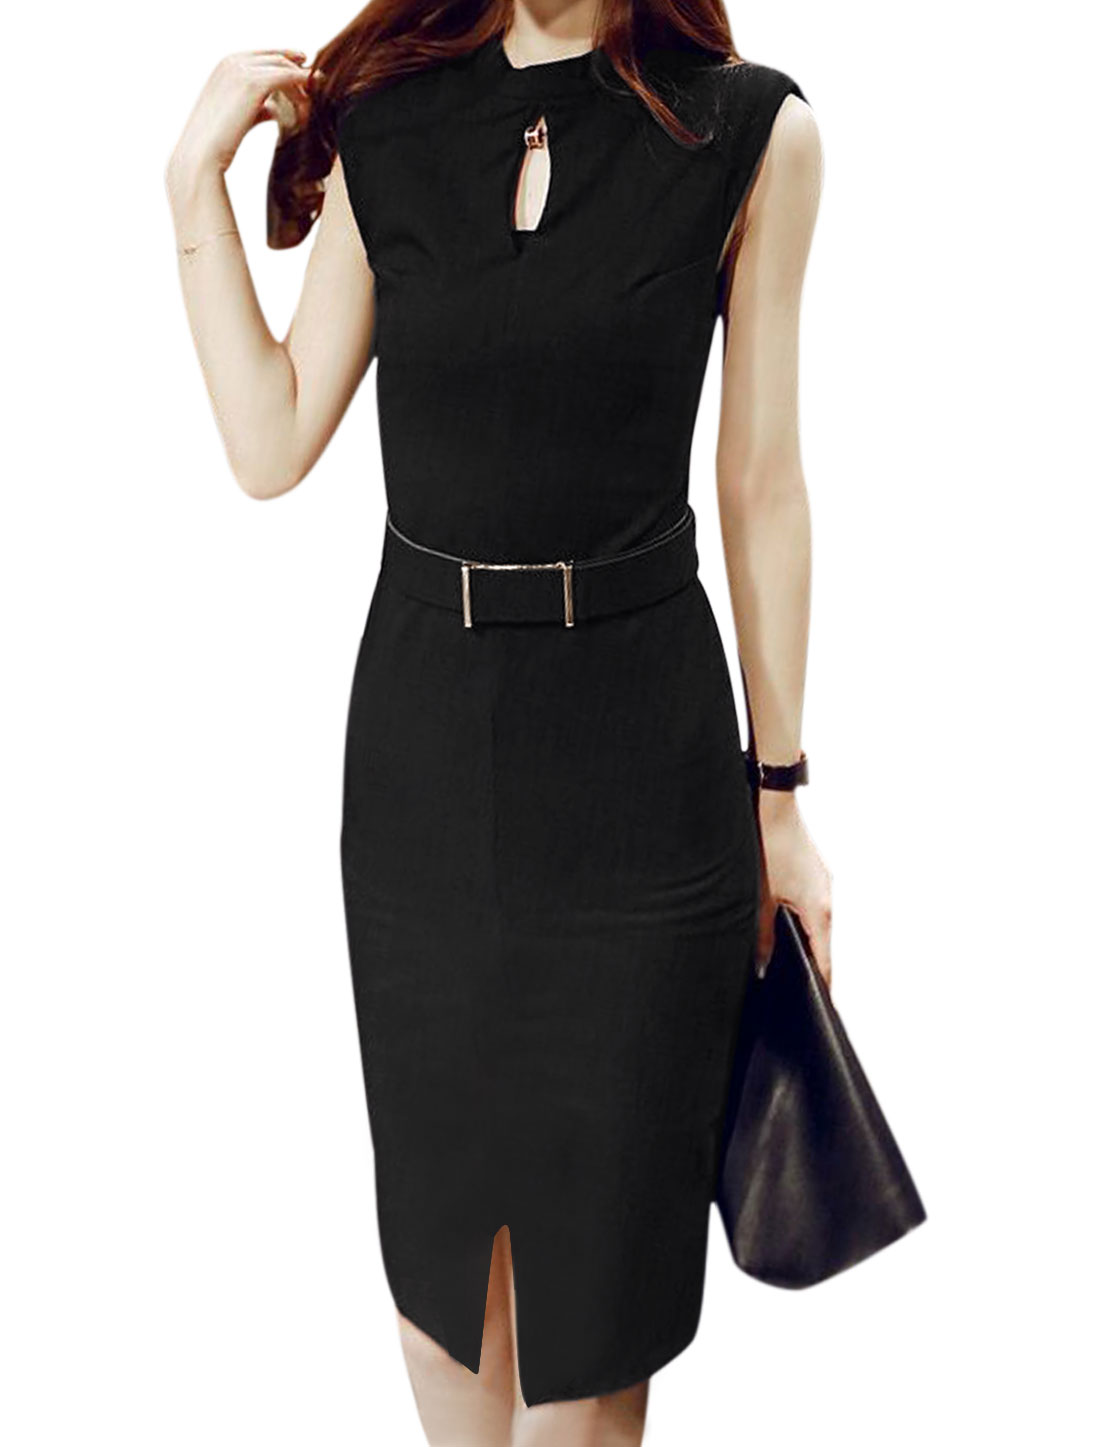 Women Stand Collar Keyhole Front Split Hem Sheath Dress w Belt Black M